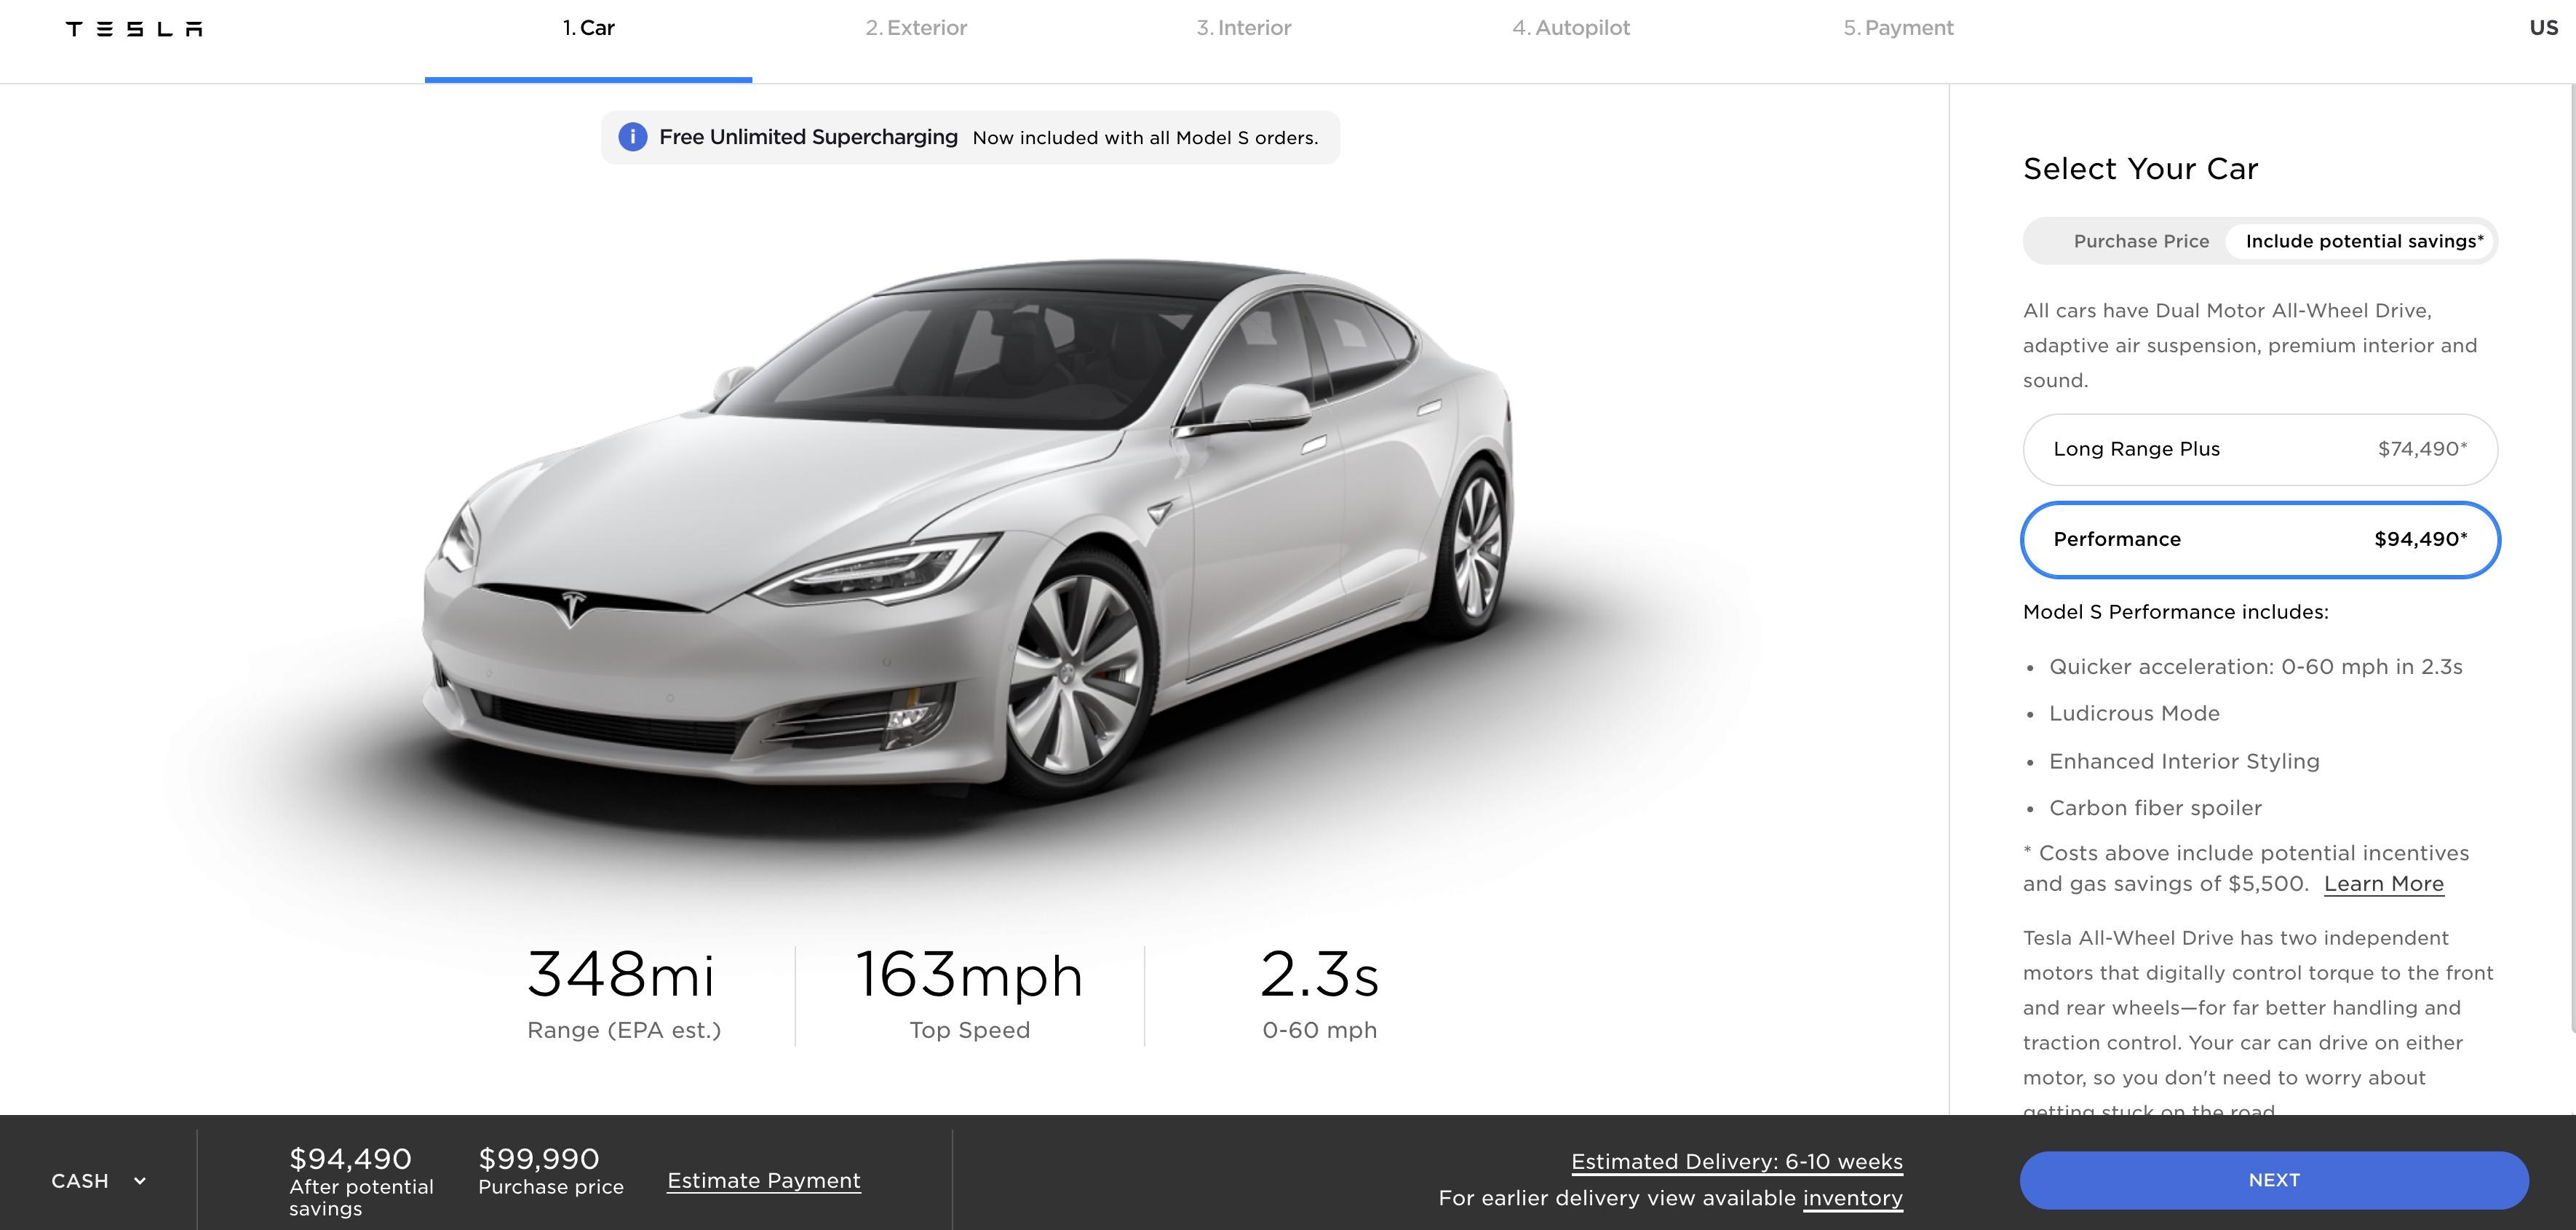 Tesla Updates Model S Performance 0 60 Mph Acceleration To 2 3 Seconds Electrek